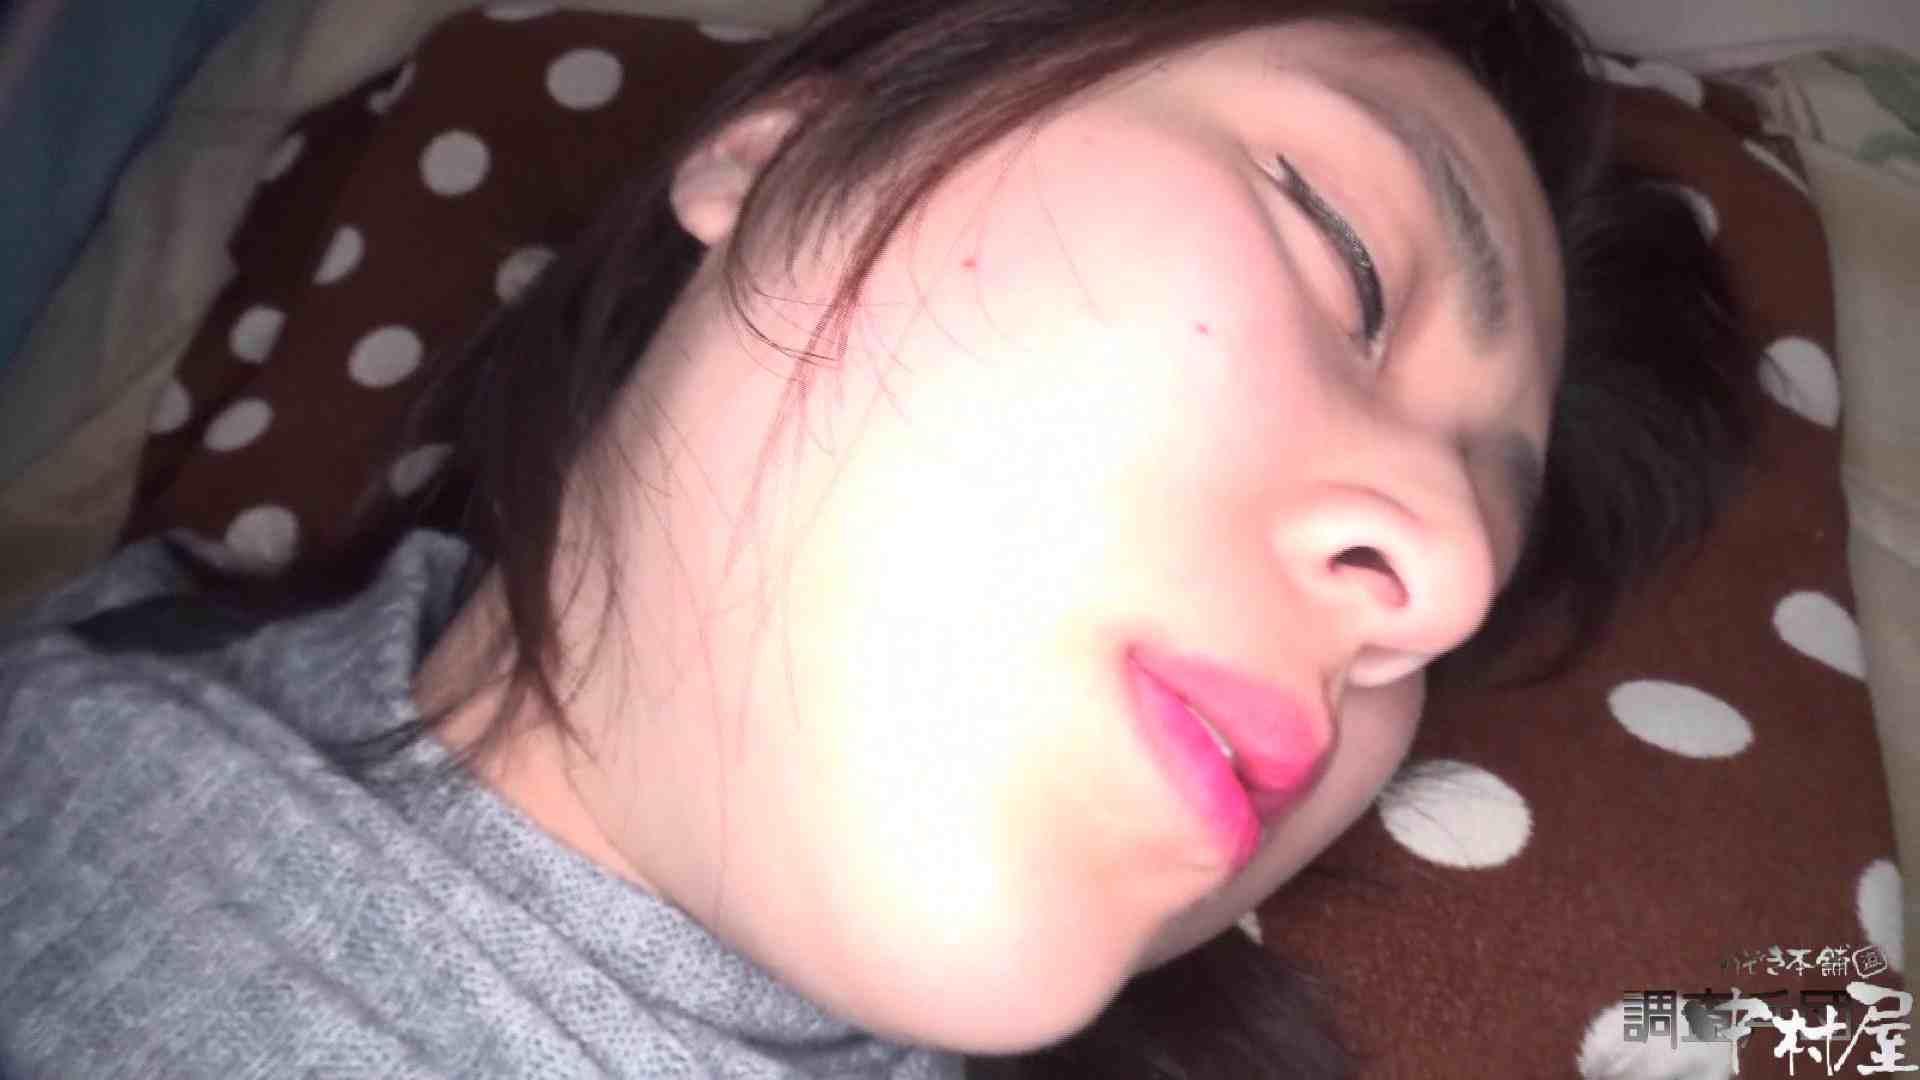 RE:~反撃の悪戯~vol.18 ジャ●ヲタ爆乳JD・ゆりっぺ生中出し【後編】 0  44連発 2